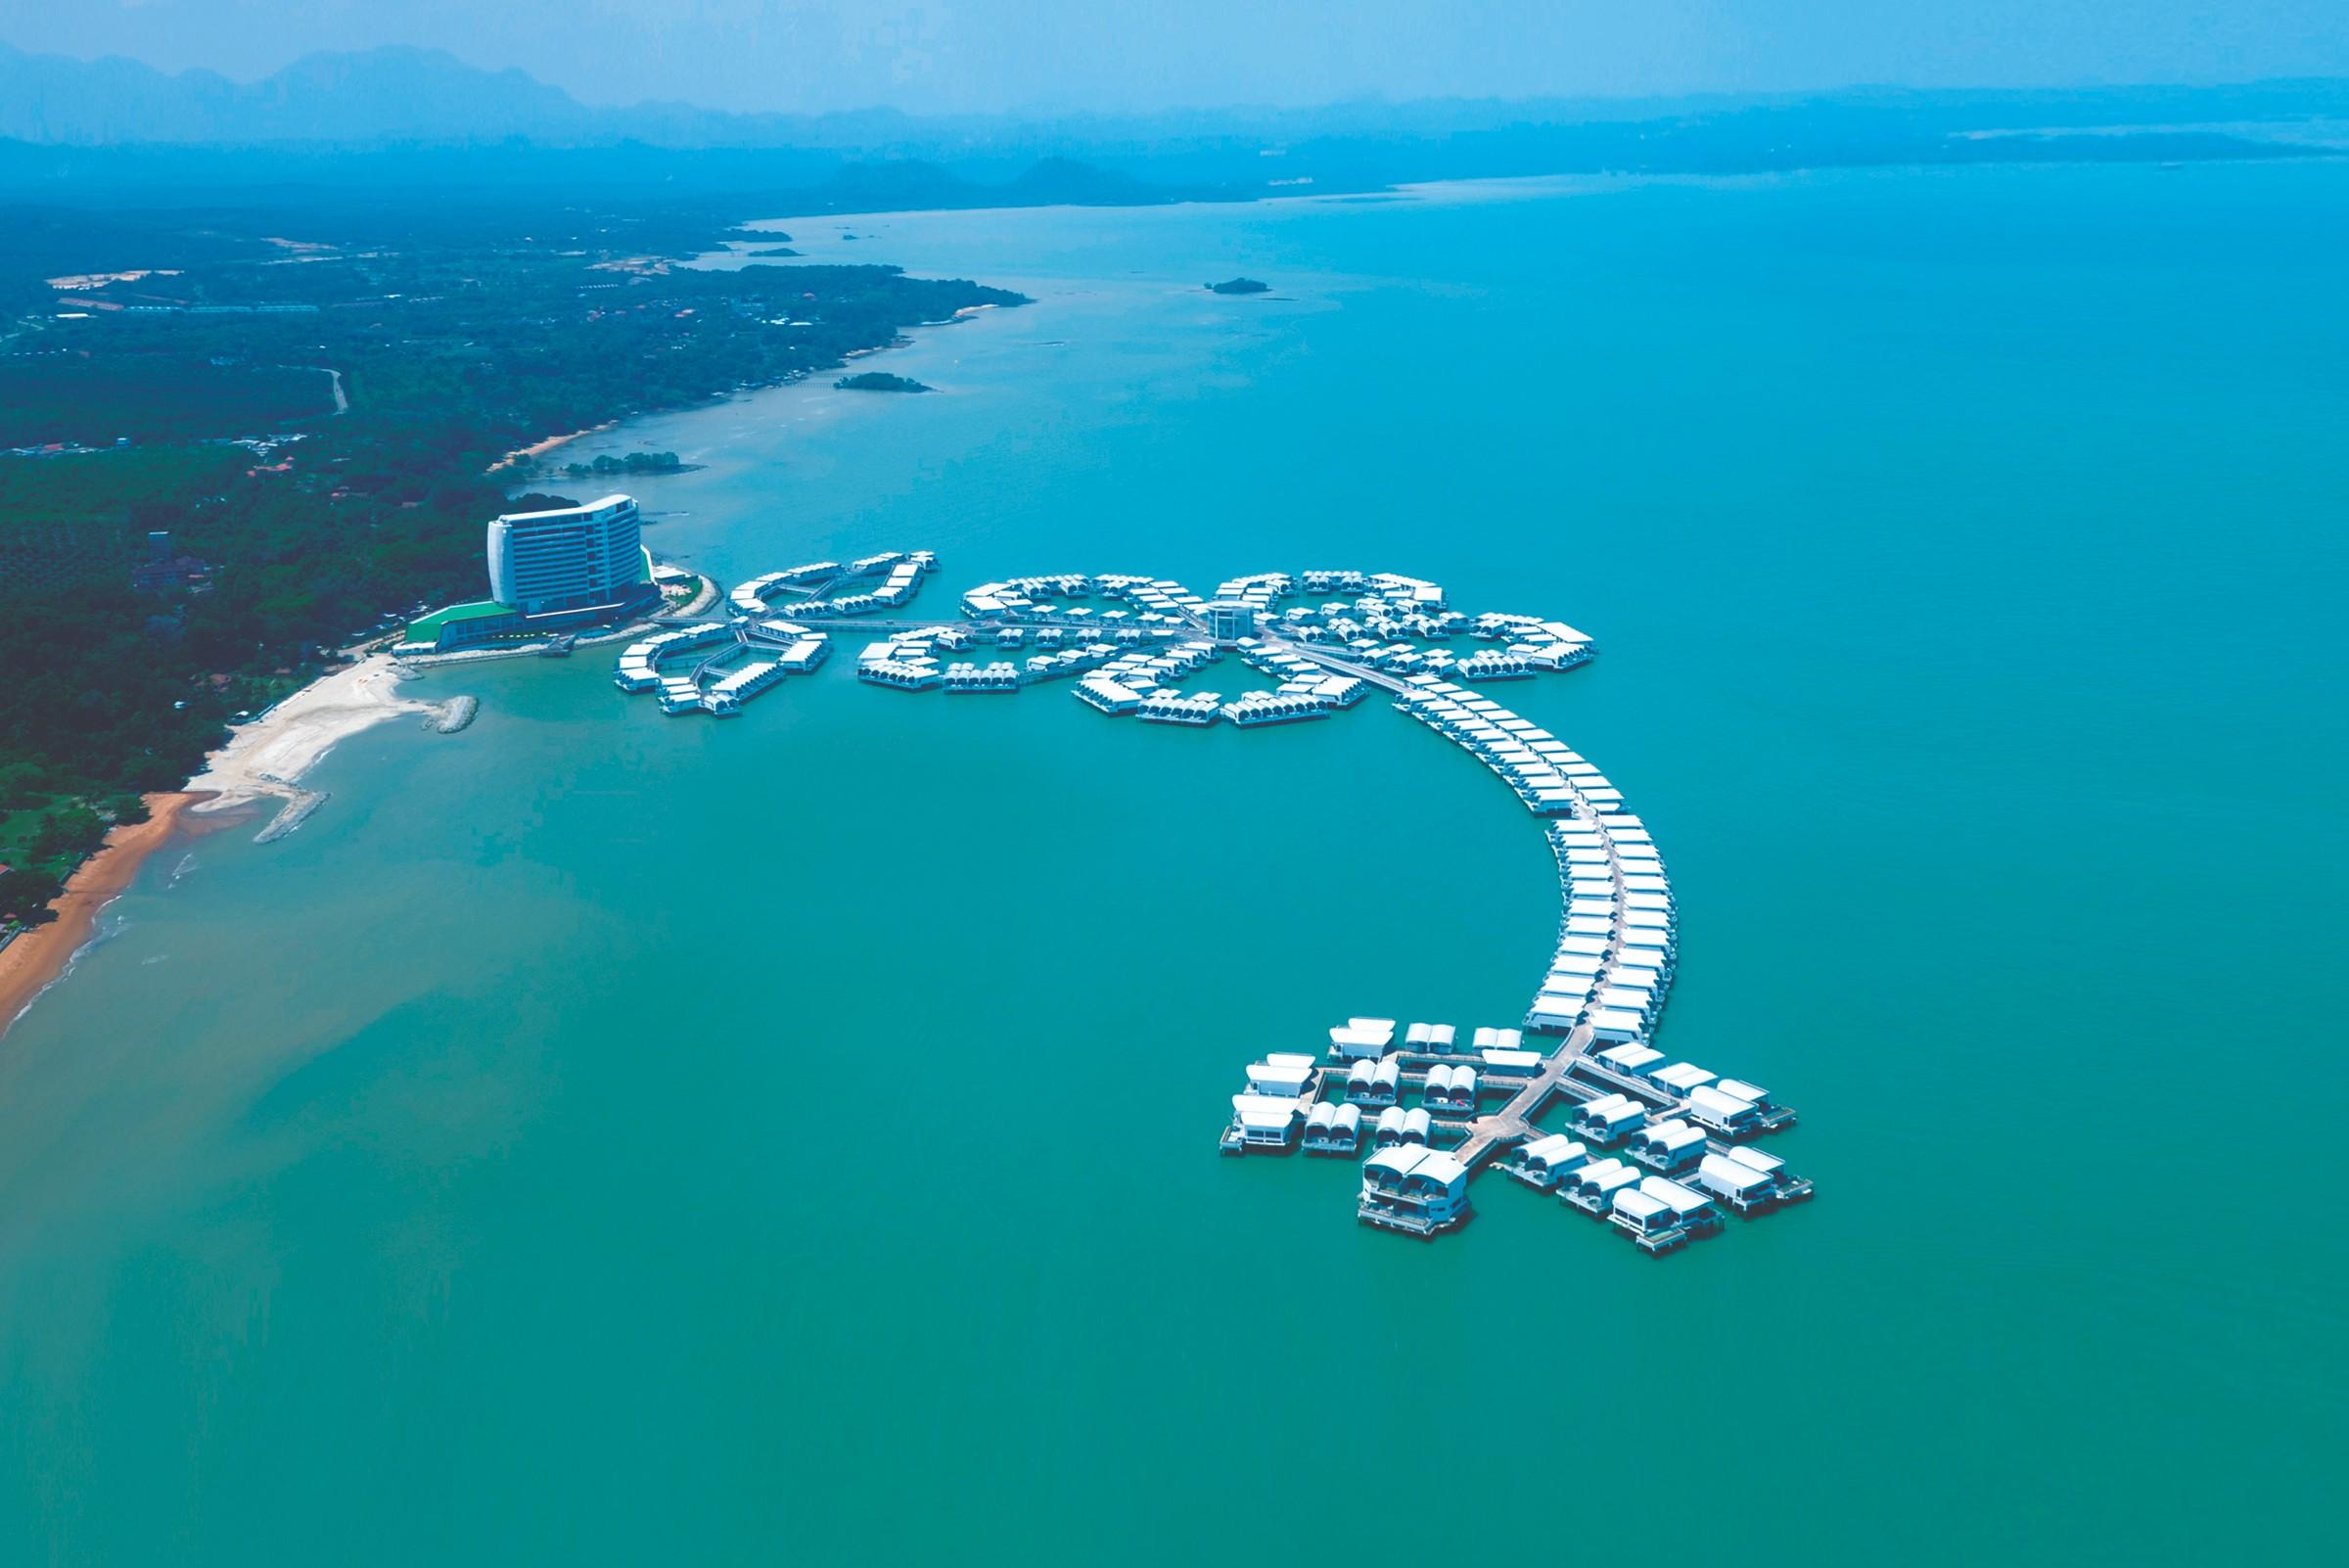 The Gold List 2020 Best International Hotel — Lexis Hibiscus Port Dickson